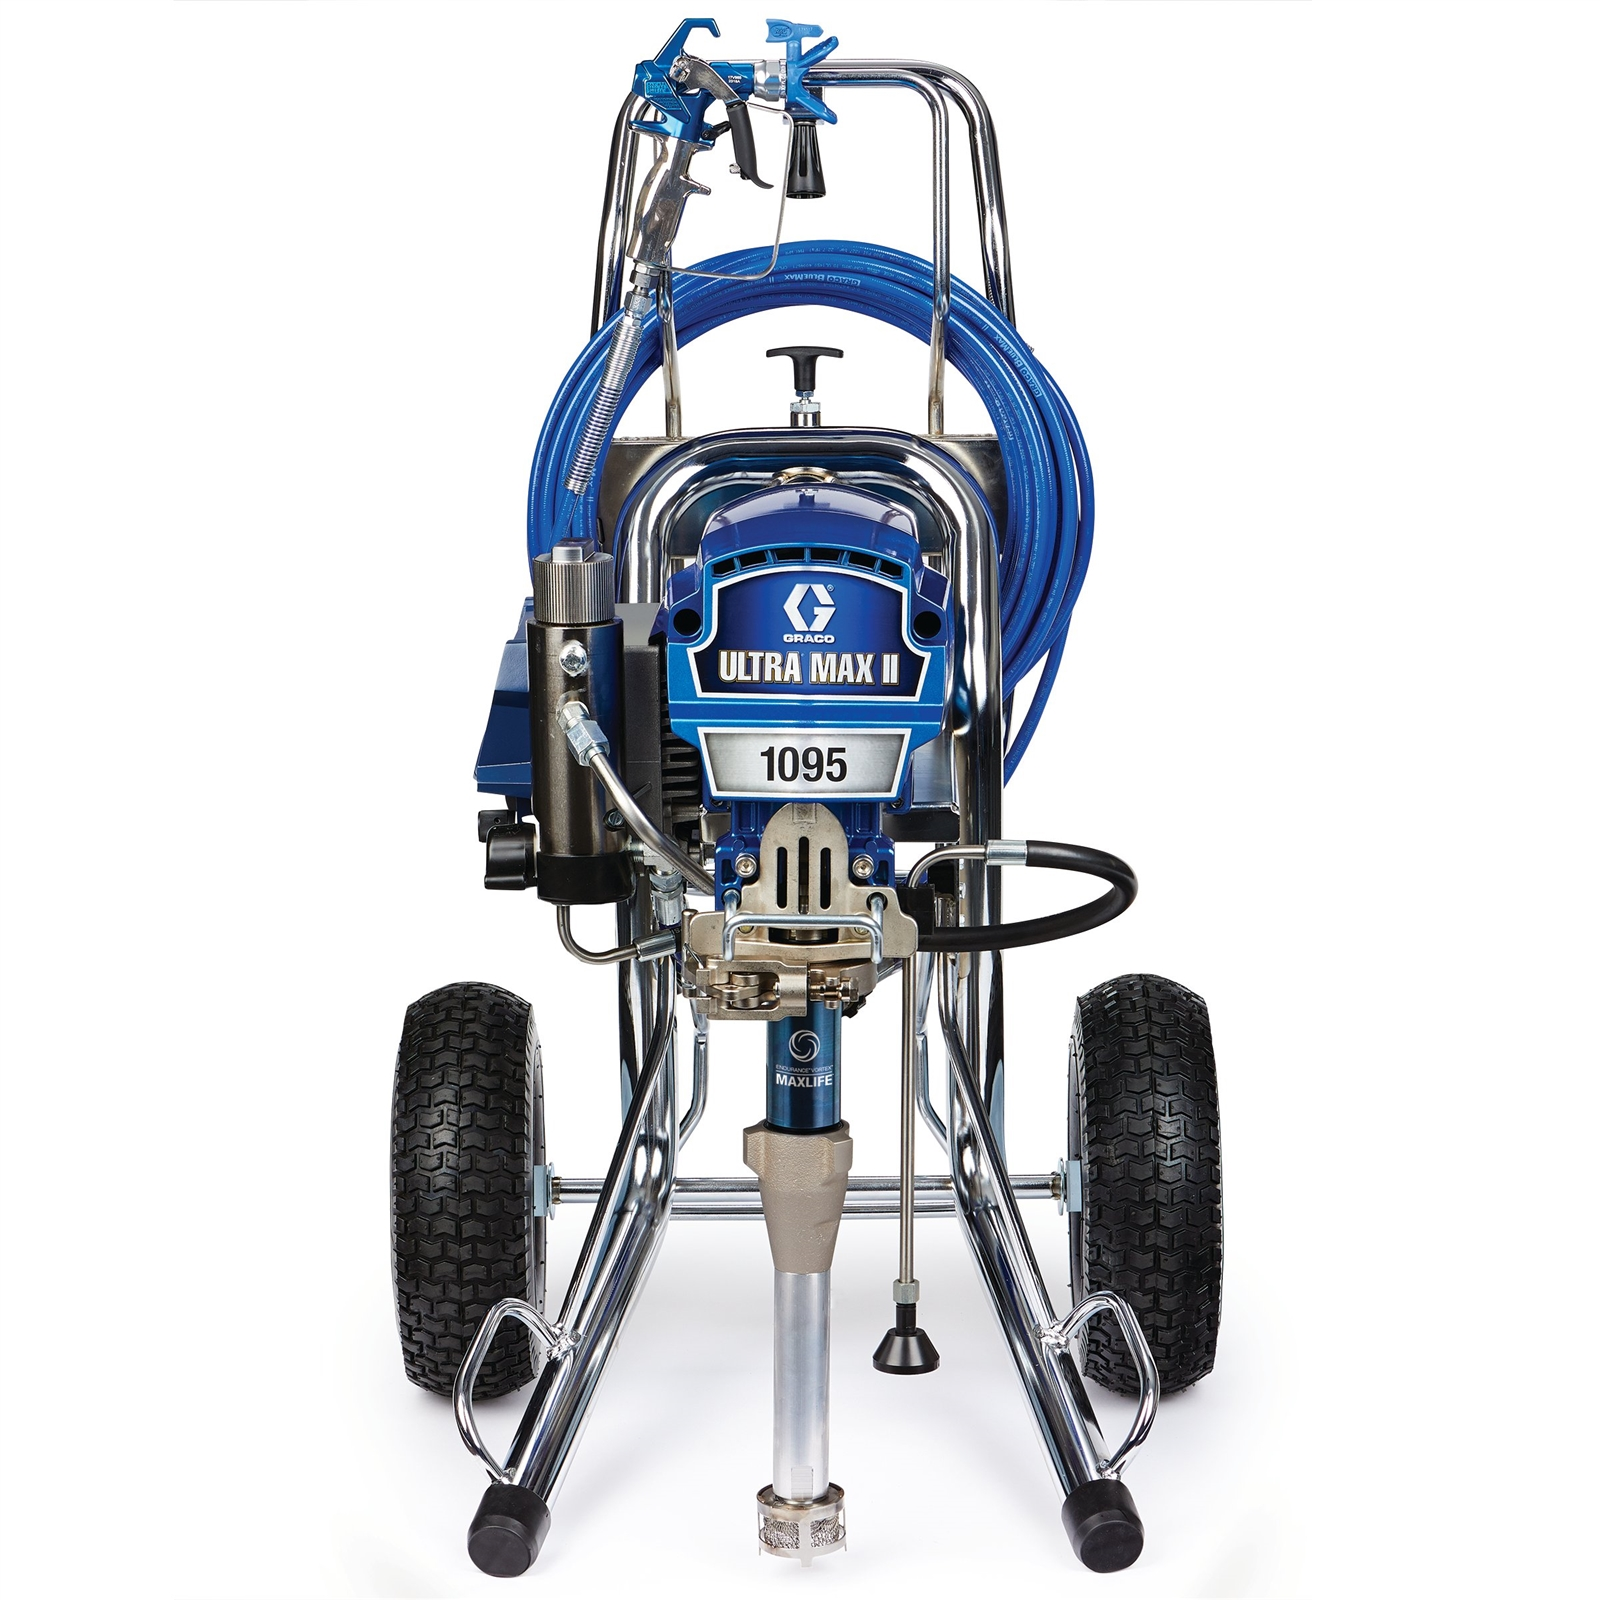 Professional Large Sprayers Graco ULTRA® MAX II Standard 1095 Hi-Boy Electric Airless Paint Sprayer